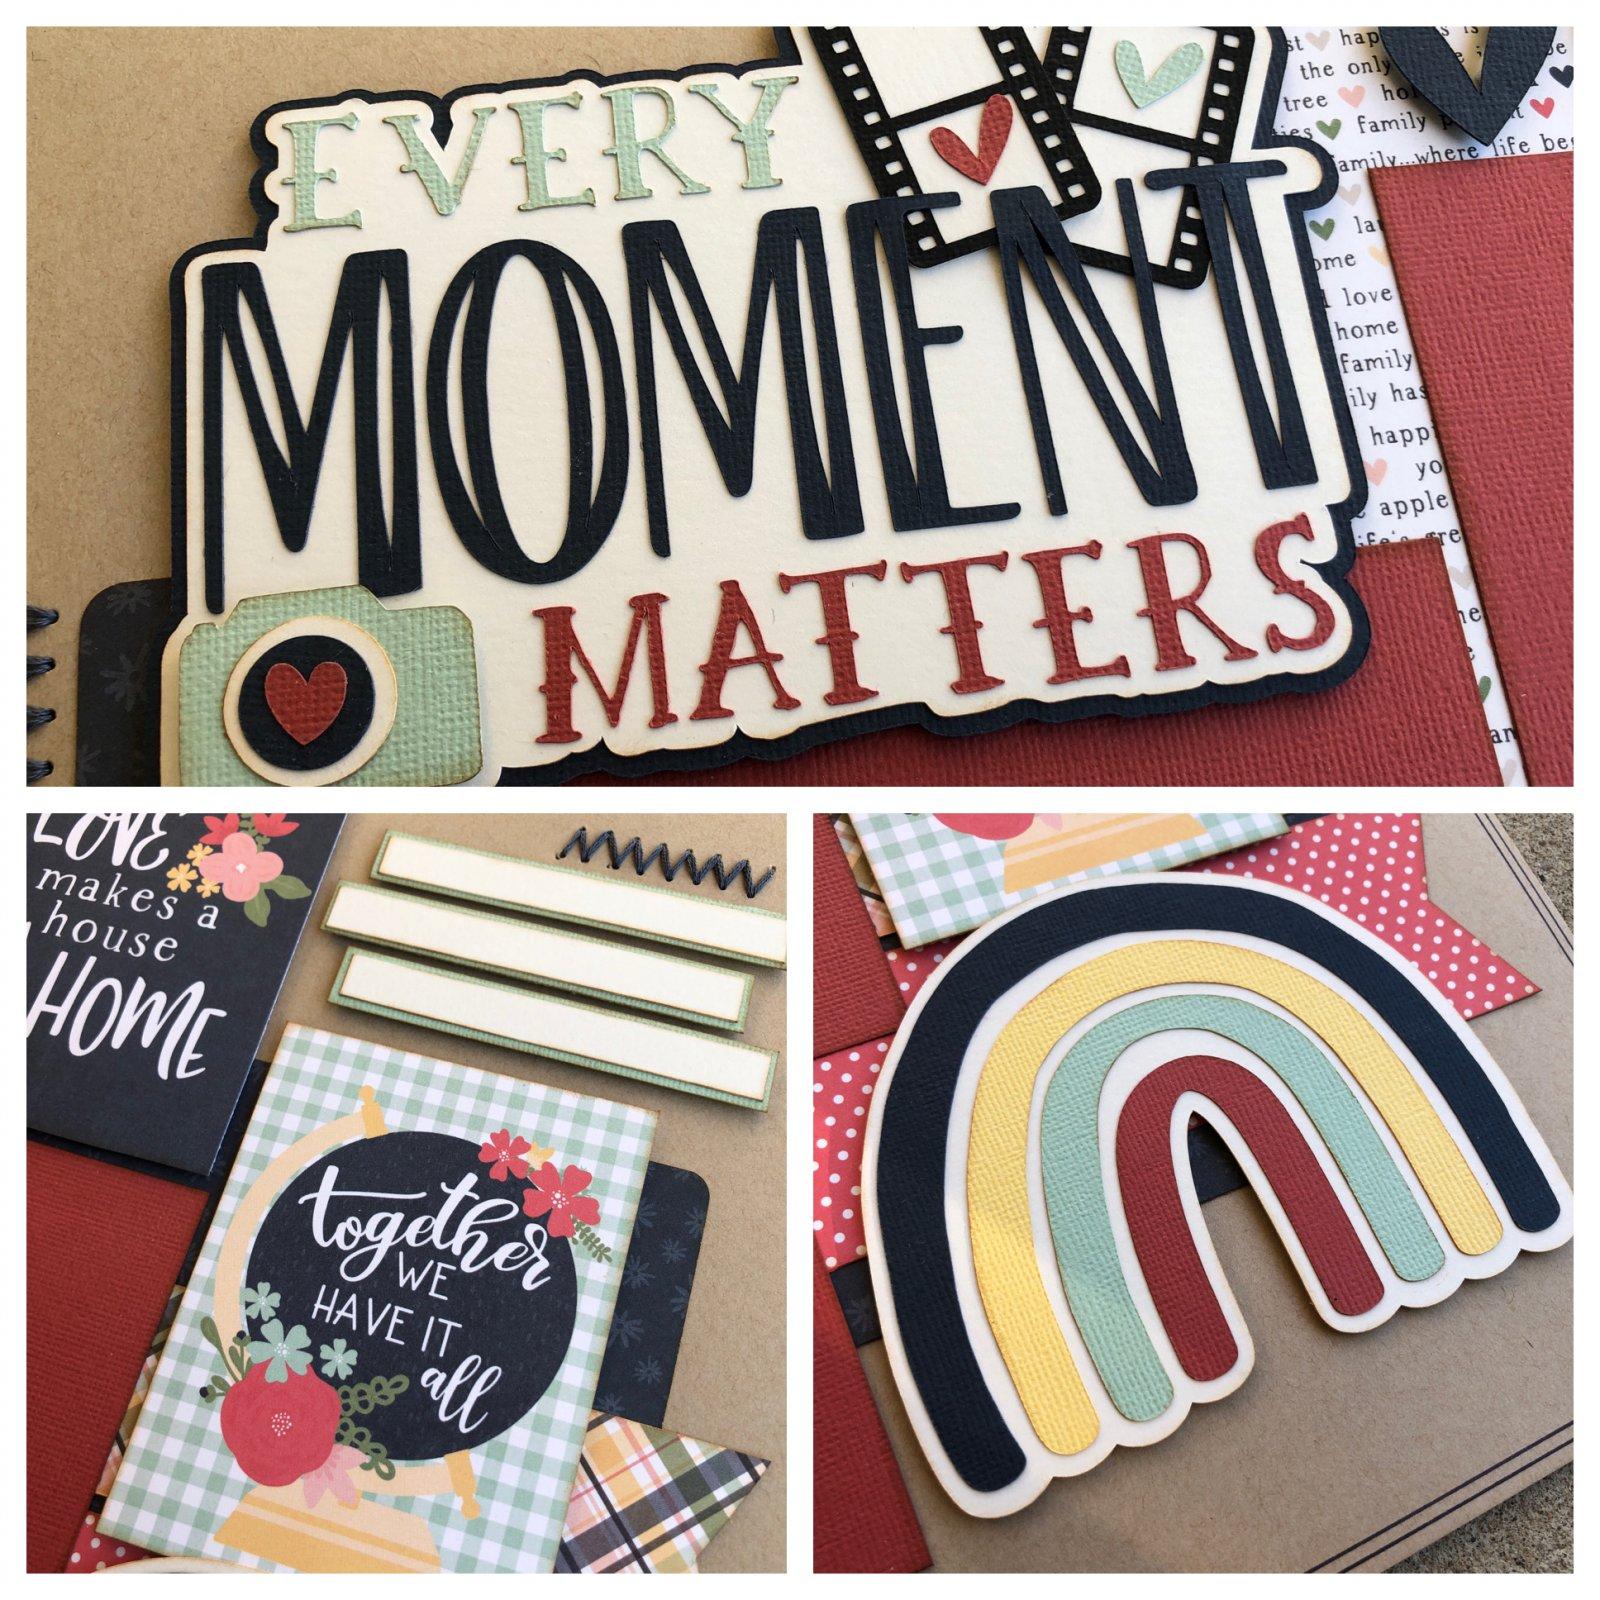 Every Moment Matters Kit